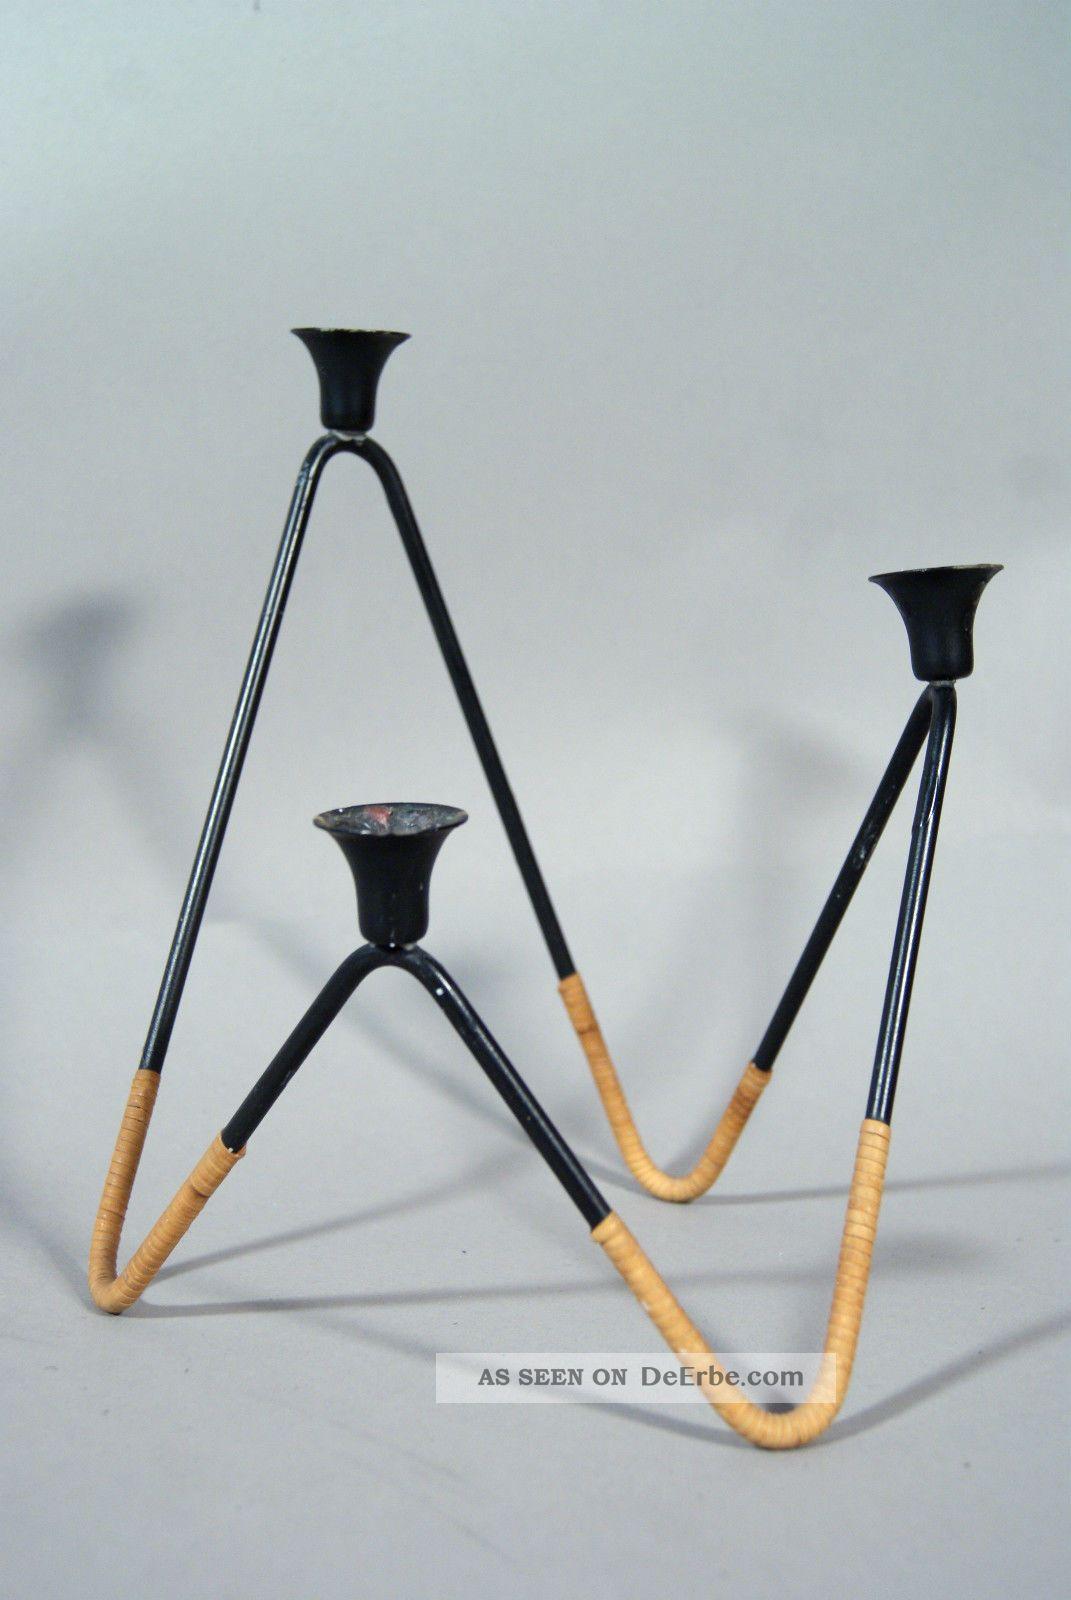 Edler String Kerzenständer°danish Design °mid - Century Candle Holder°kerzenhalter 1950-1959 Bild